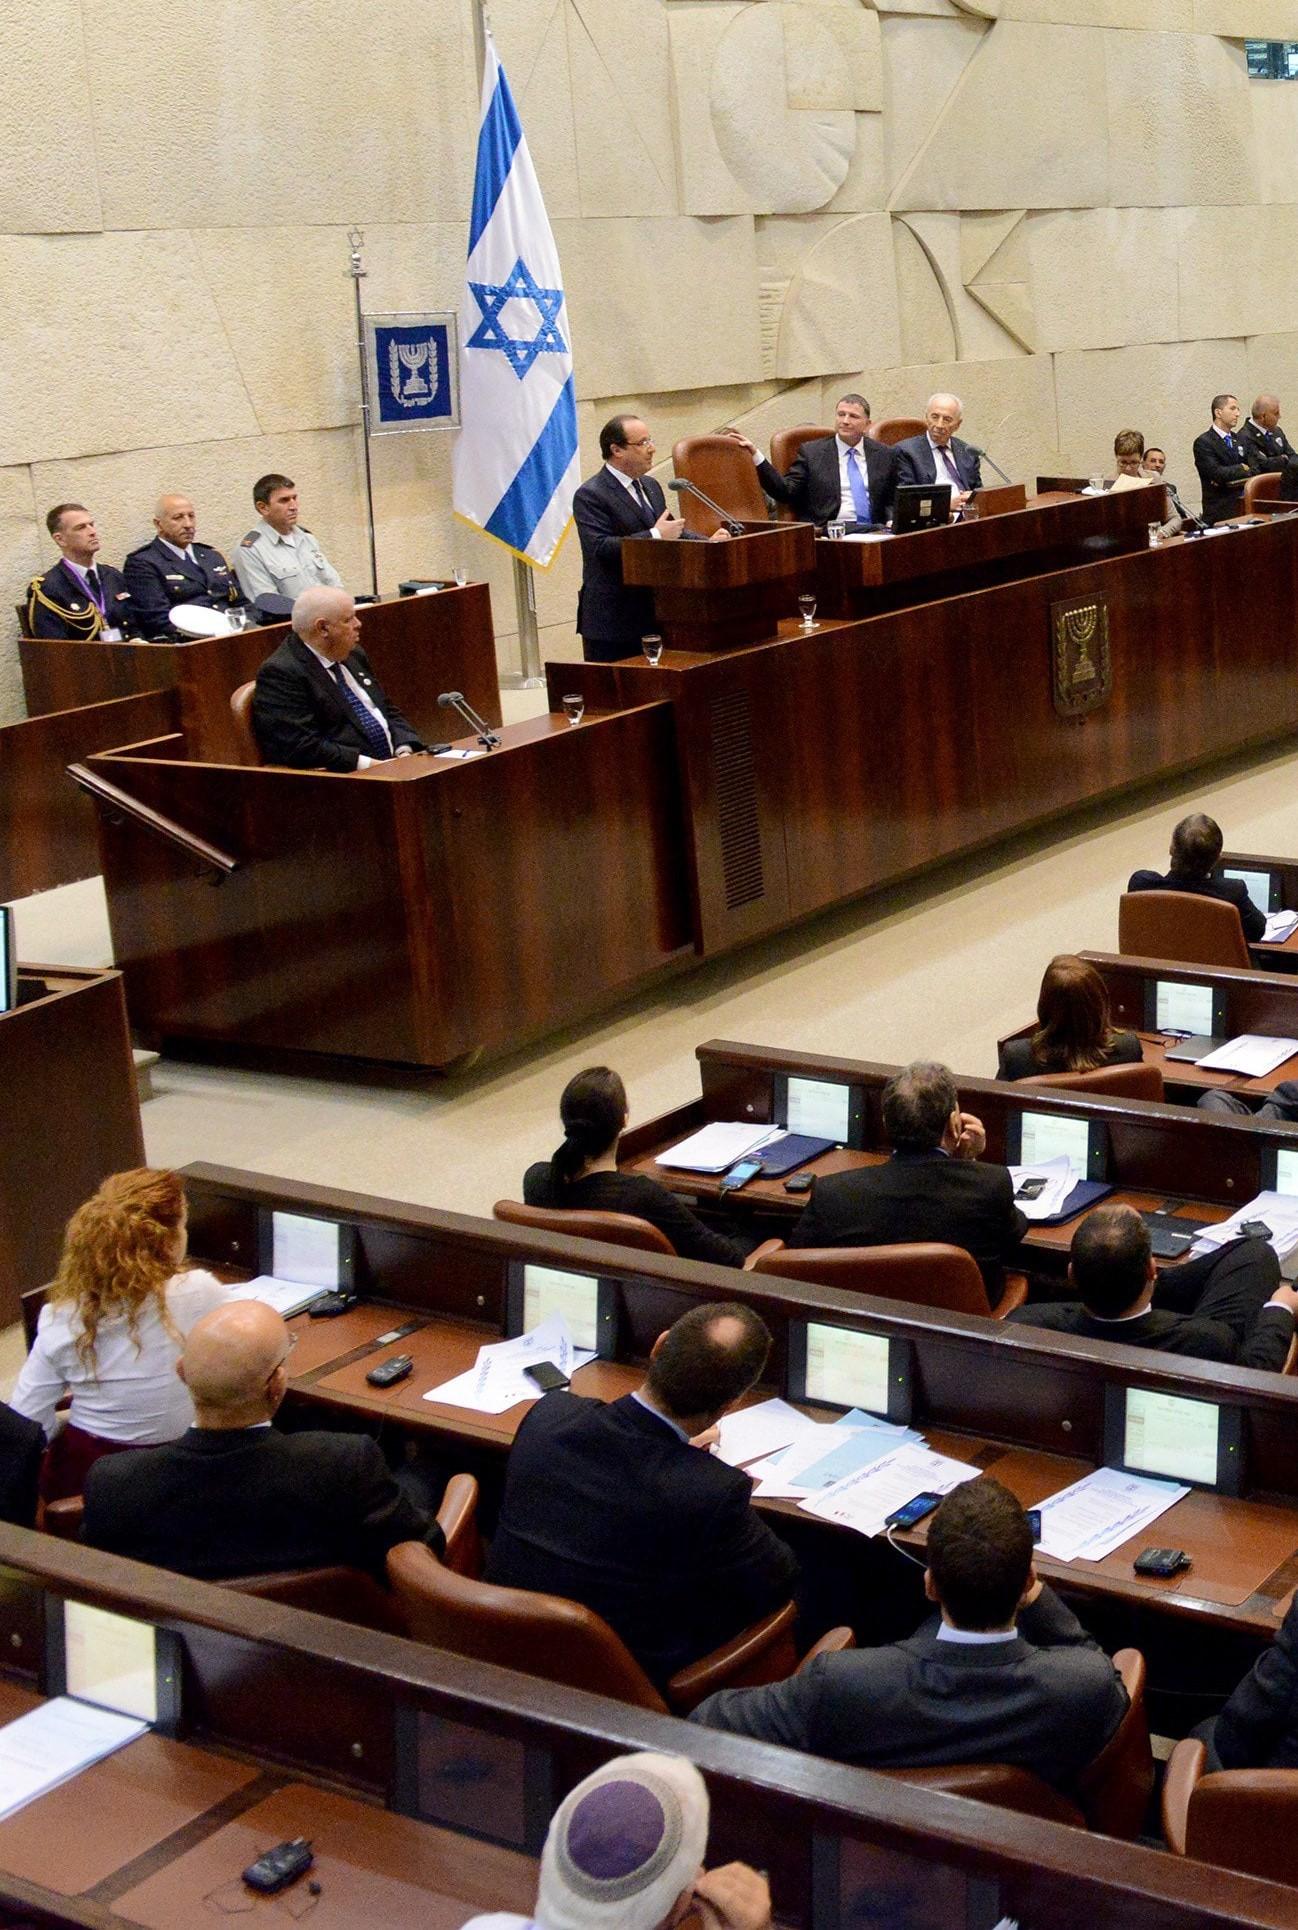 newprimeministernaftalibennettunveilshisworkplanforisrael